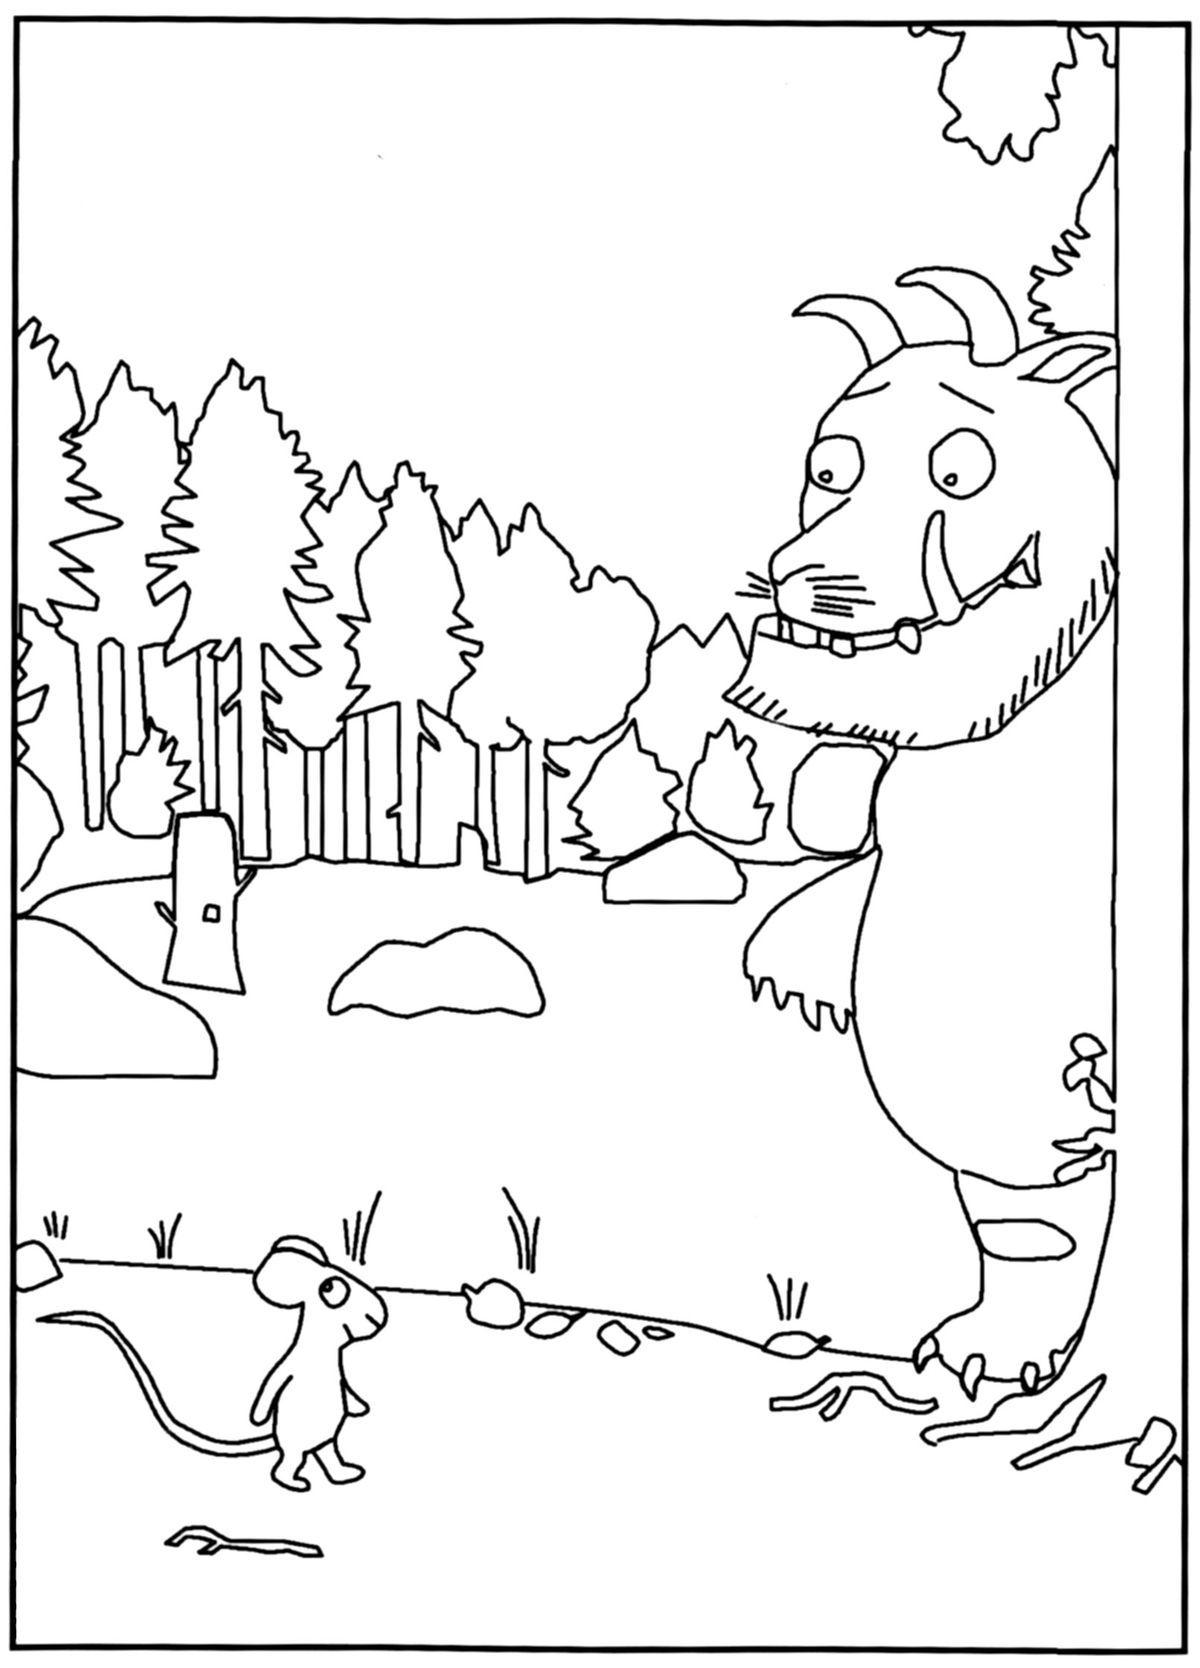 10 Glad Monster Sad Monster Coloring Page